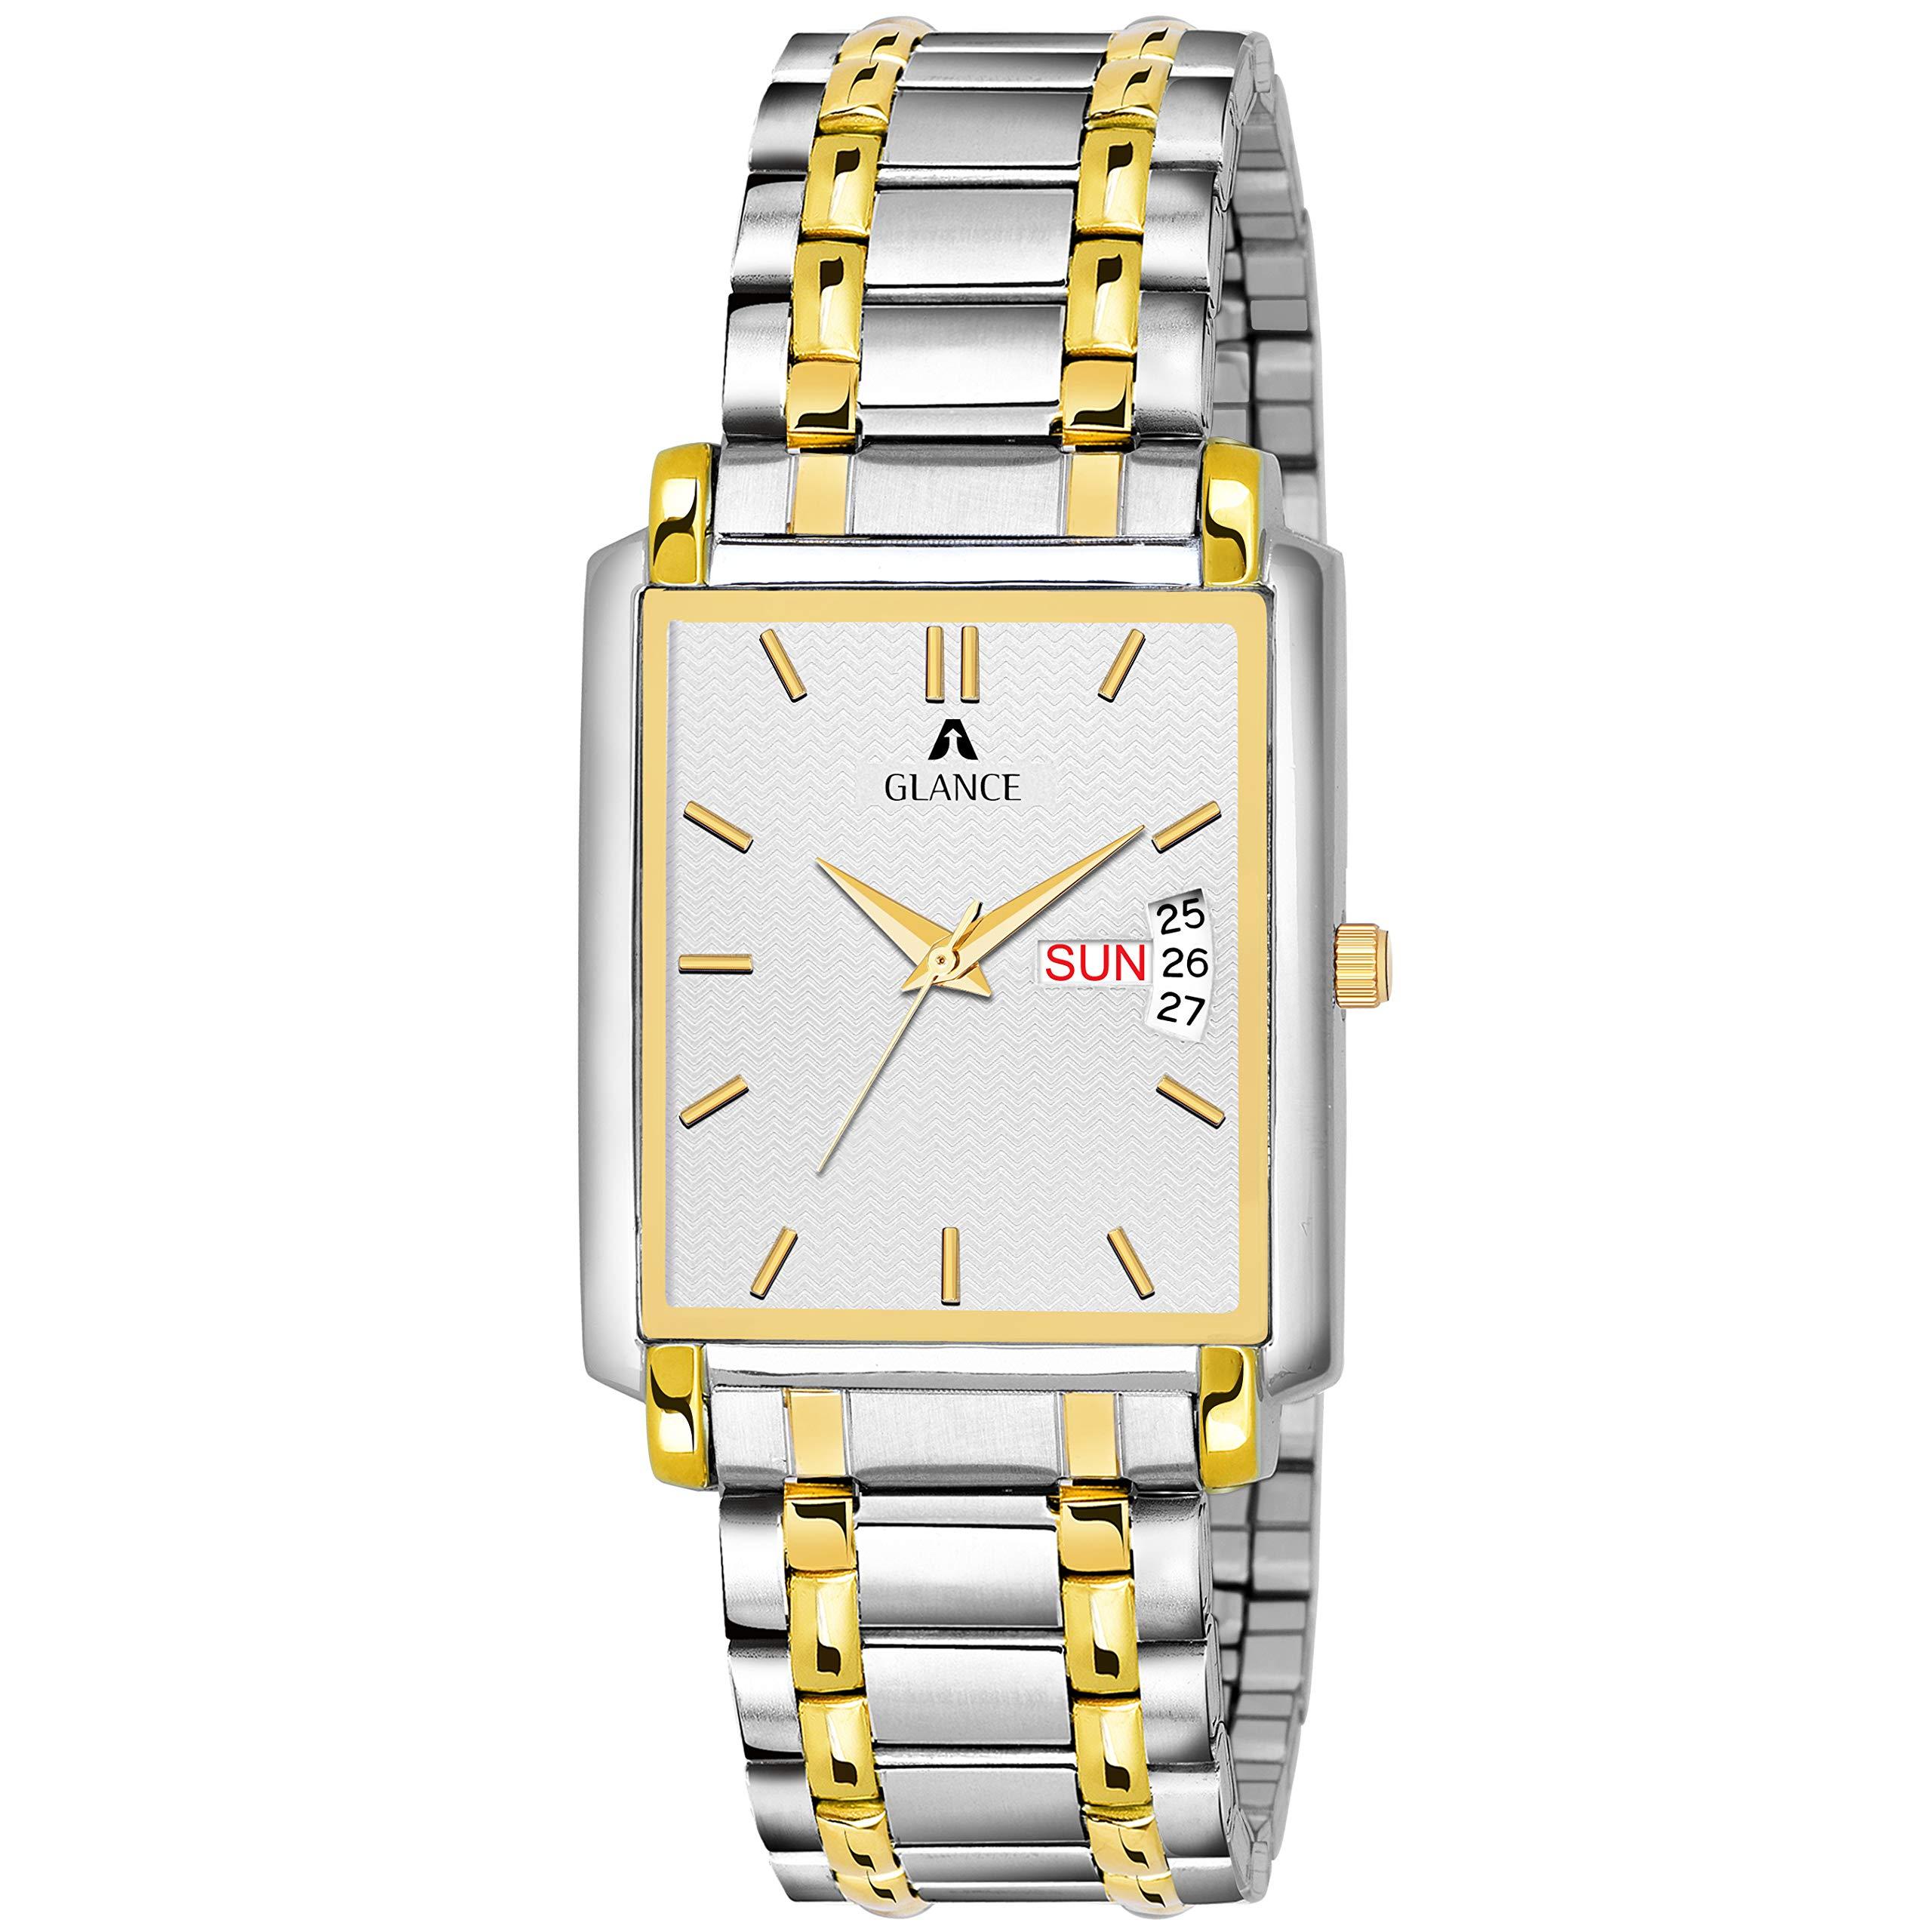 Aglance 1506bm01 Silver Dial Mens Watch (B07YSCRJ1R) Amazon Price History, Amazon Price Tracker